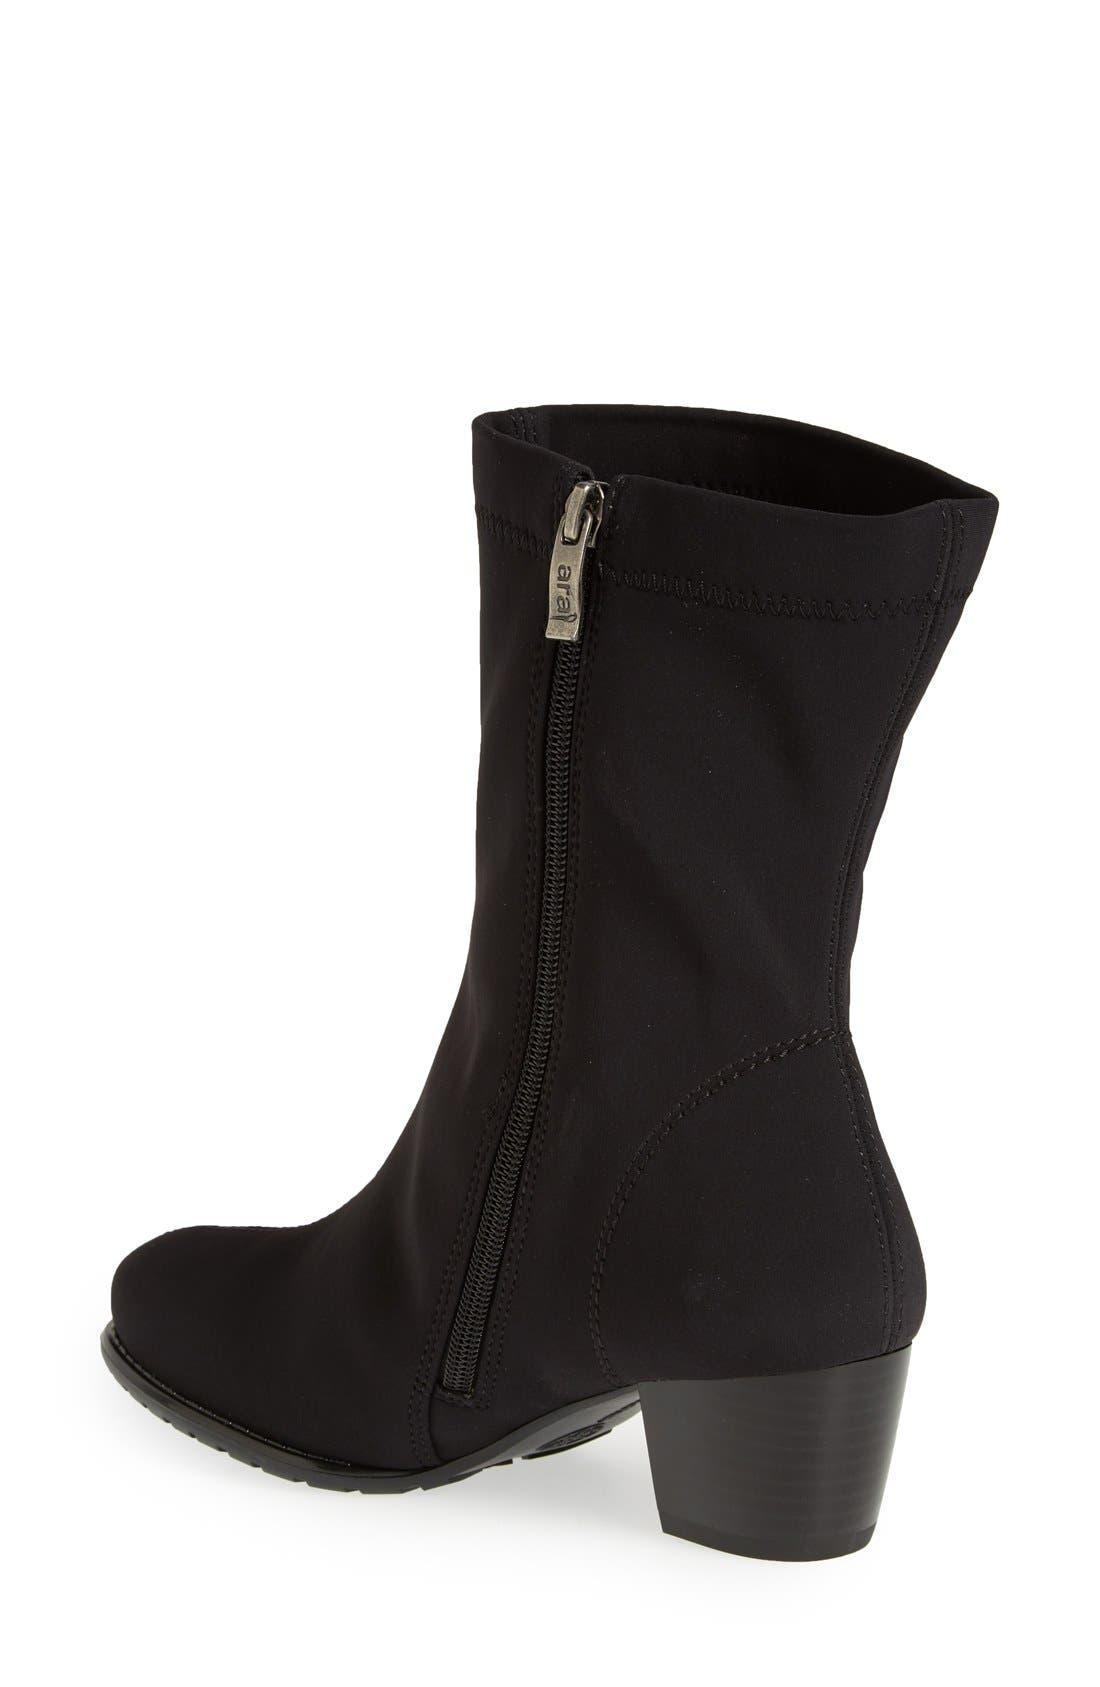 'Fairfax' Waterproof Gore-Tex<sup>®</sup> Block Heel Boot,                             Alternate thumbnail 2, color,                             Black Fabric